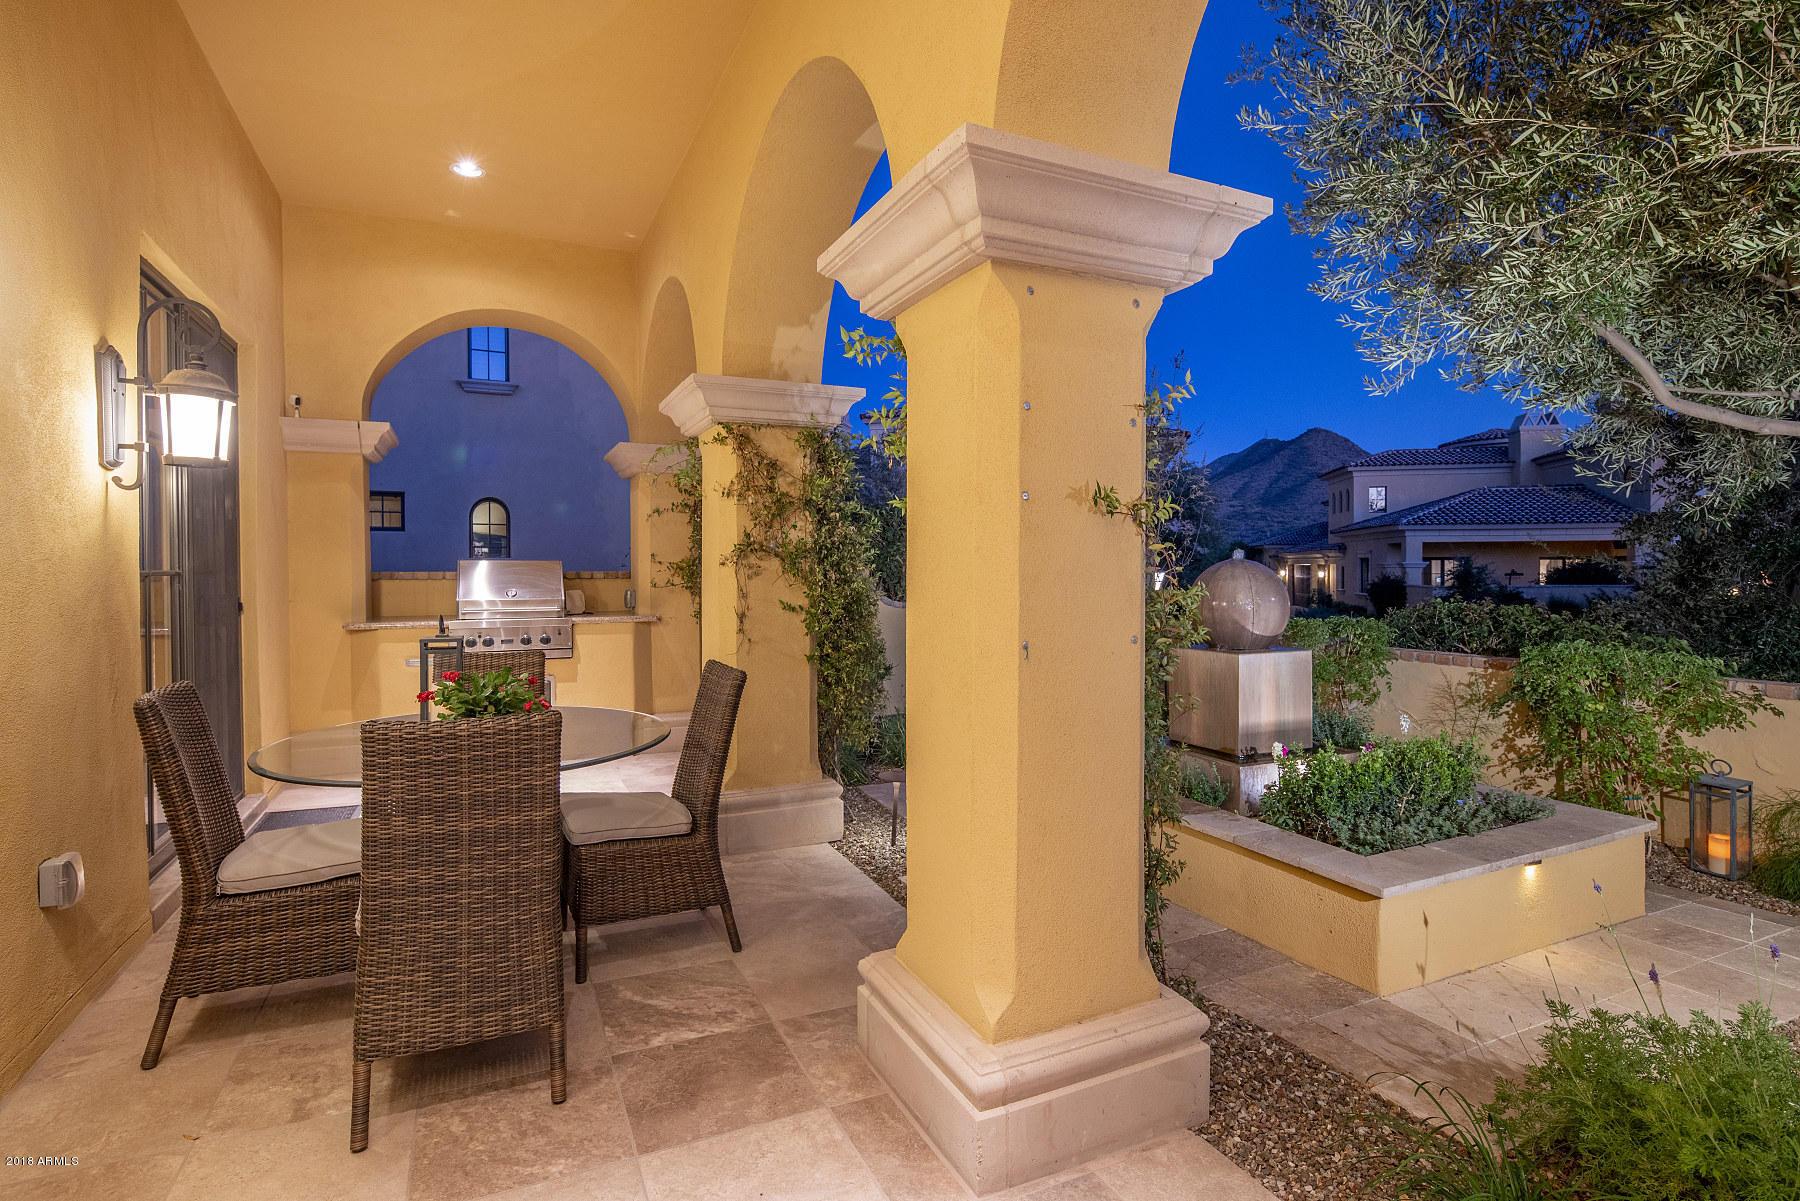 MLS 5852135 18964 N 101ST Street Unit 3, Scottsdale, AZ 85255 Scottsdale AZ Silverleaf